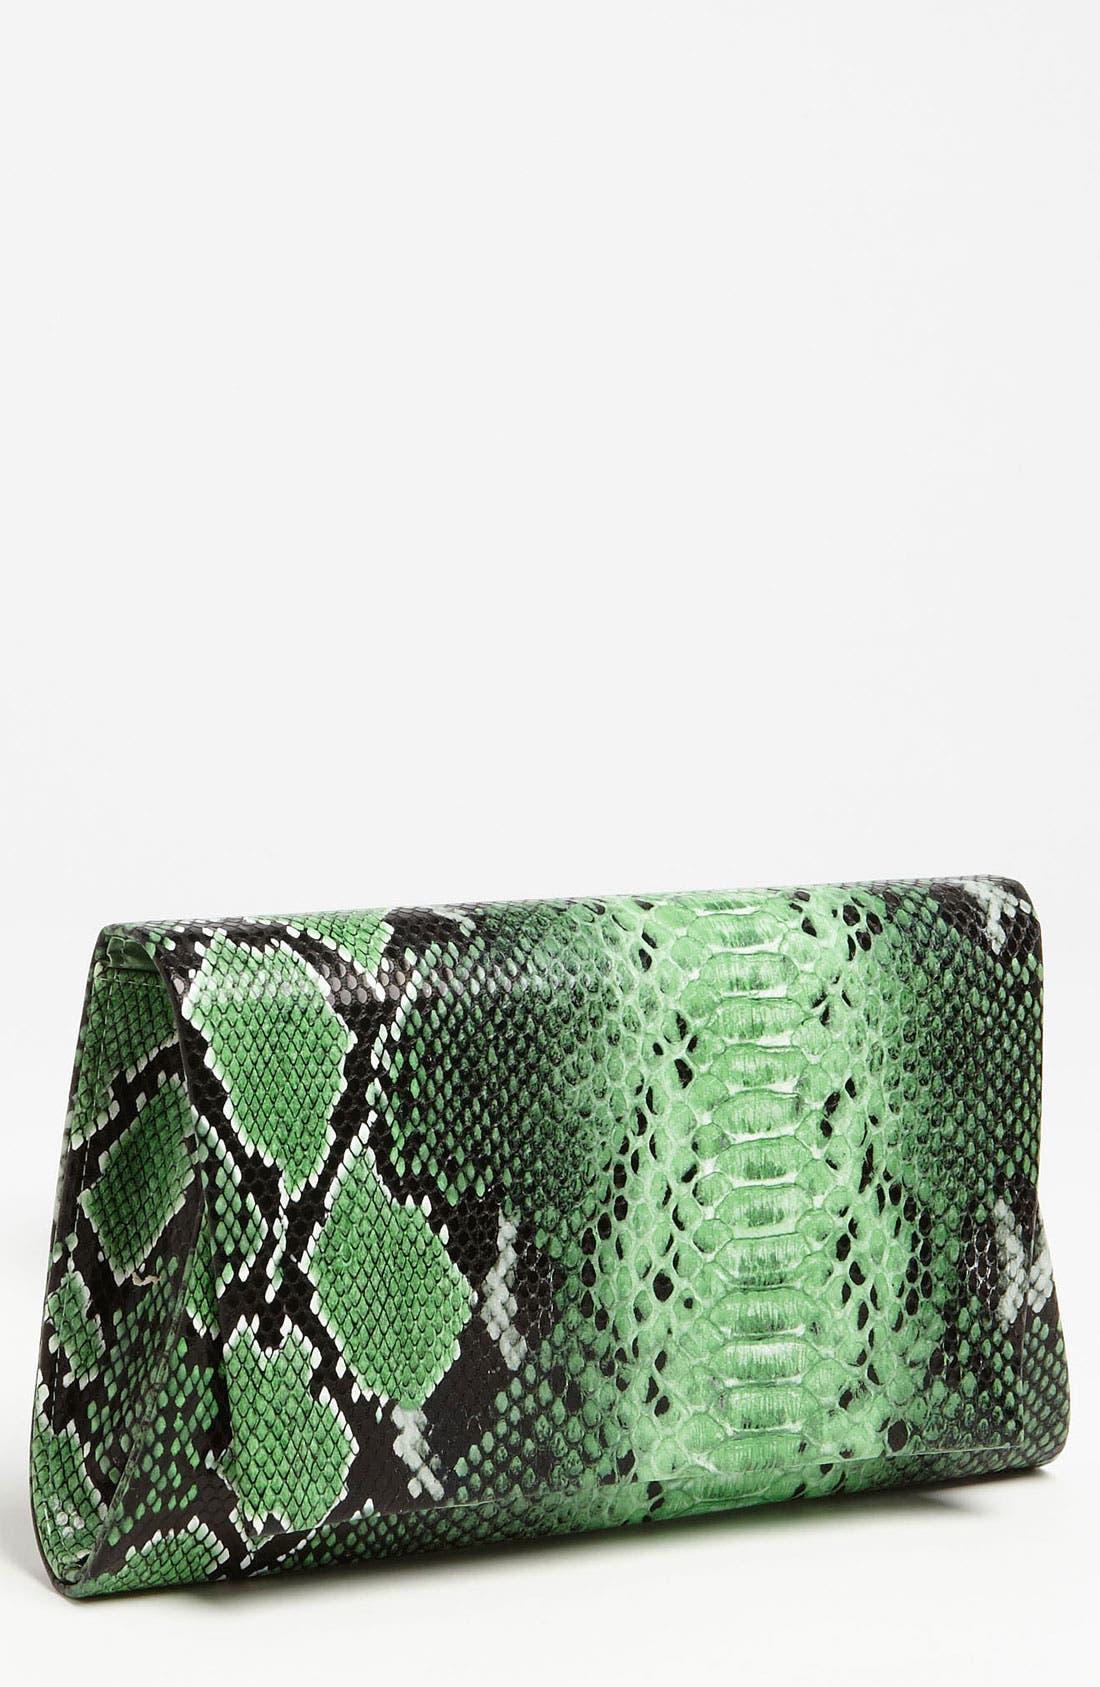 Main Image - Natasha Couture Foldover Snake Embossed Clutch